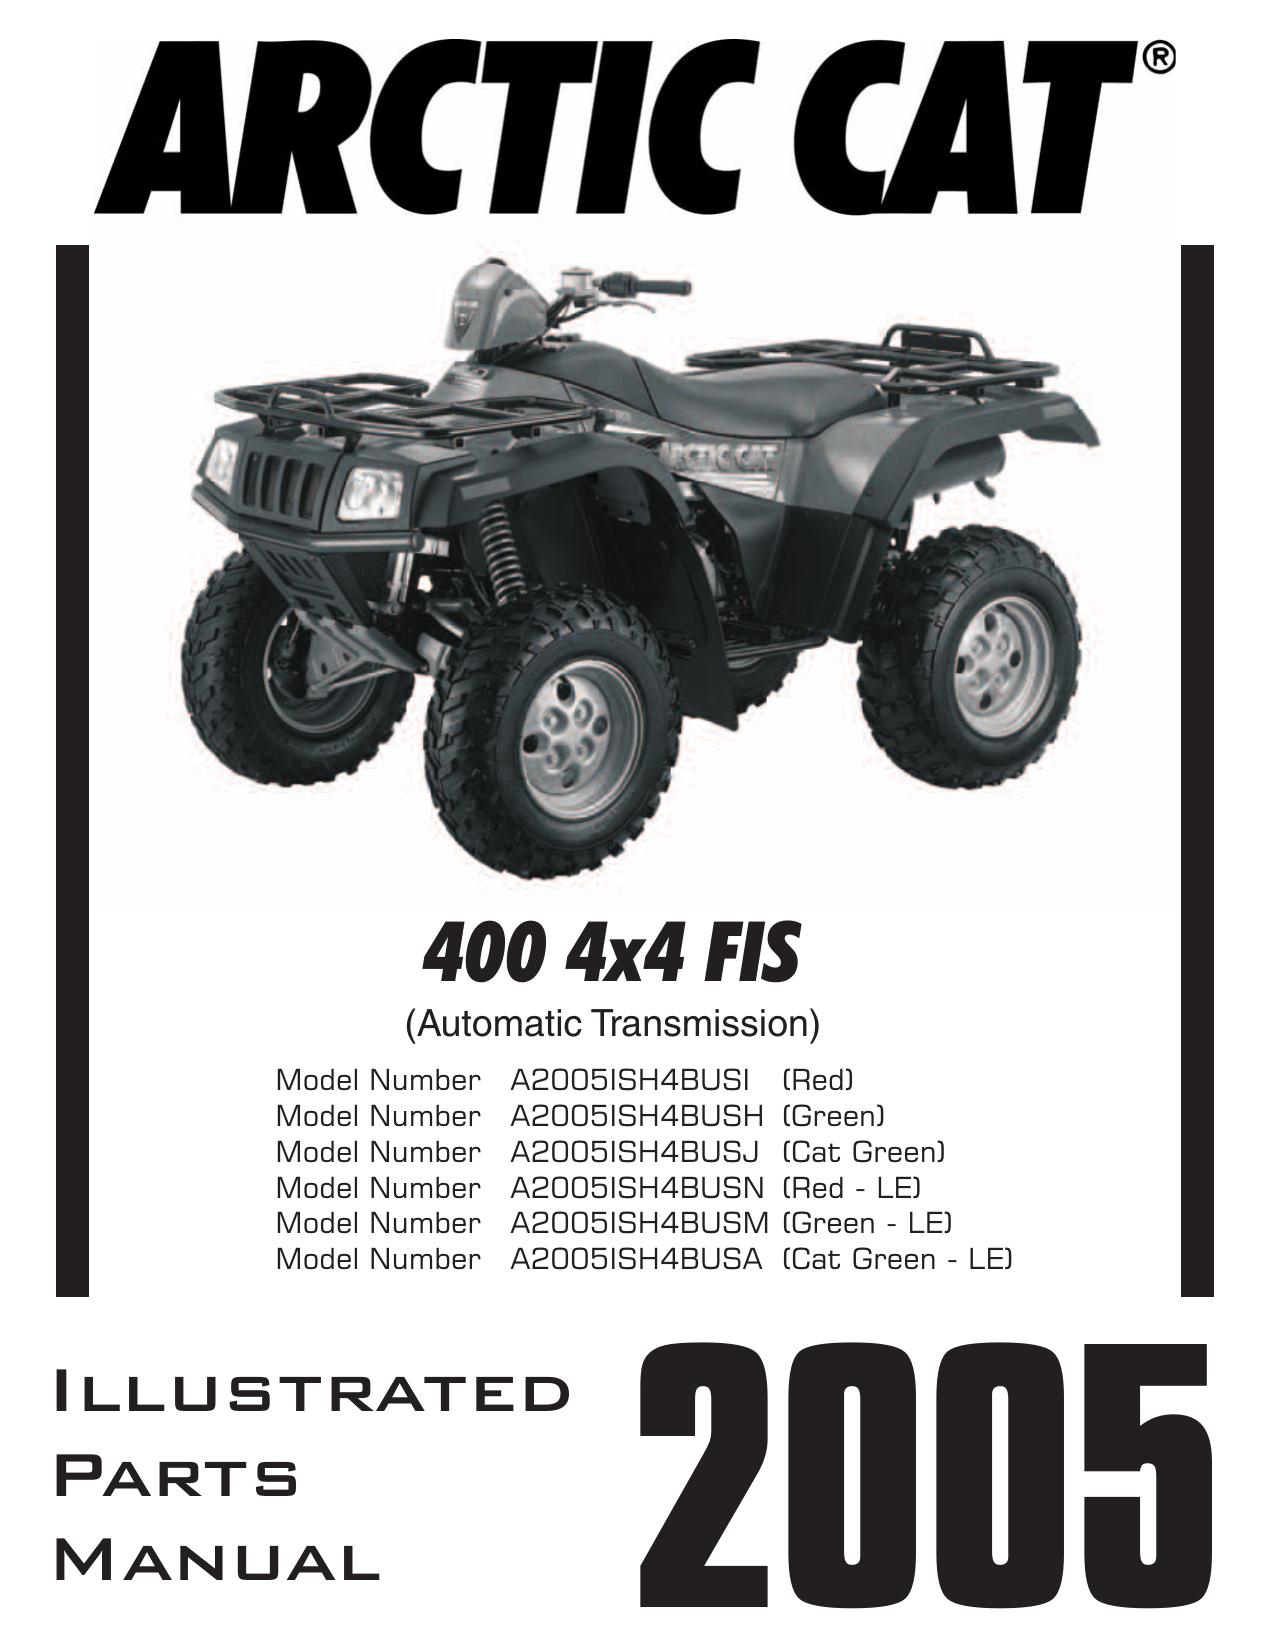 CLUTCH GASKET FITS ARCTIC CAT 3402-589